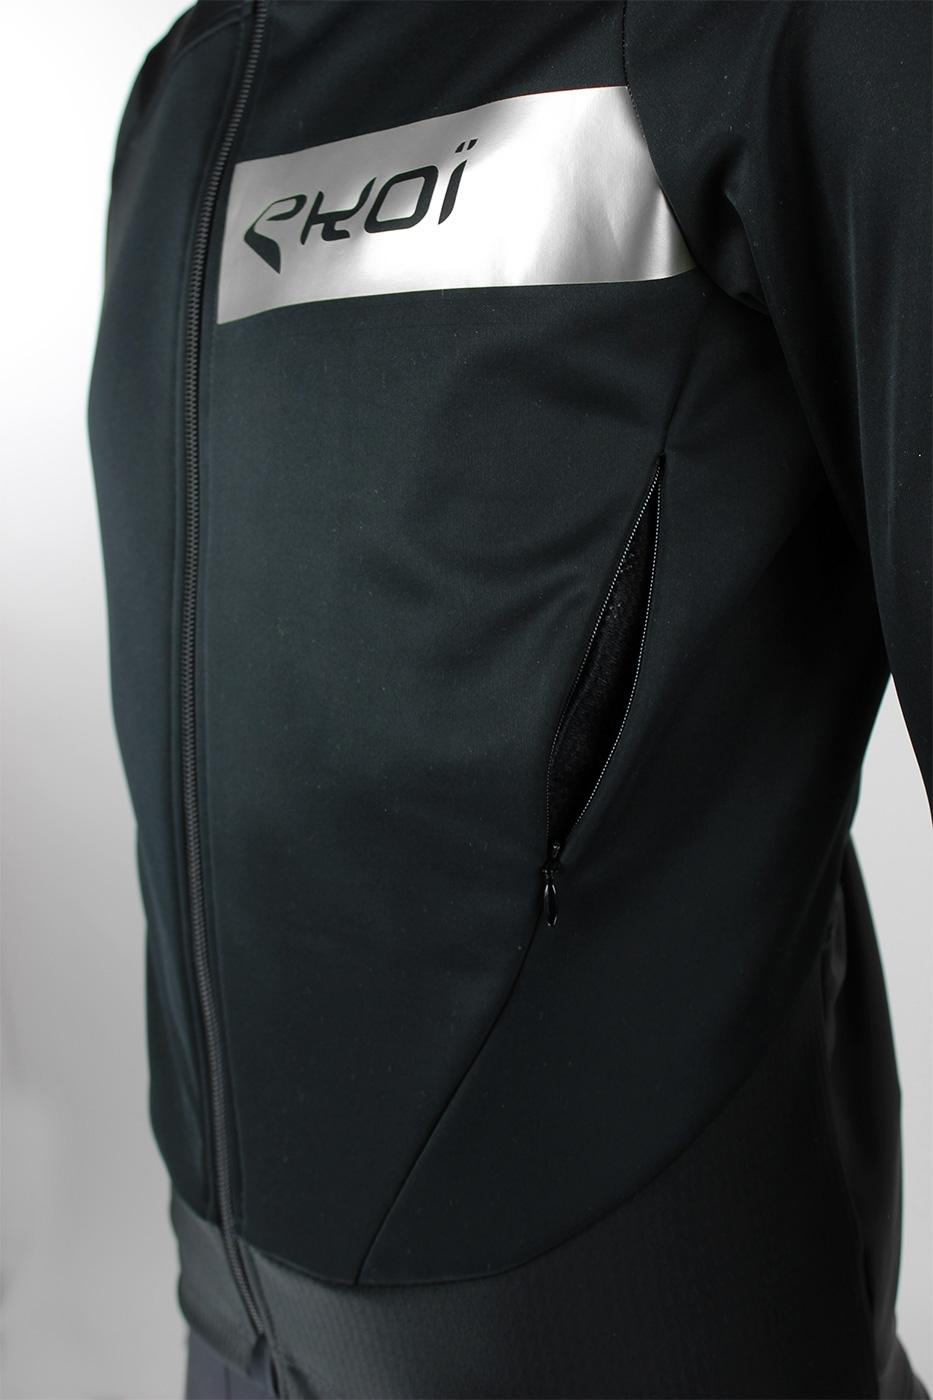 veste thermique ekoi black chrome elegance dry ekoi. Black Bedroom Furniture Sets. Home Design Ideas